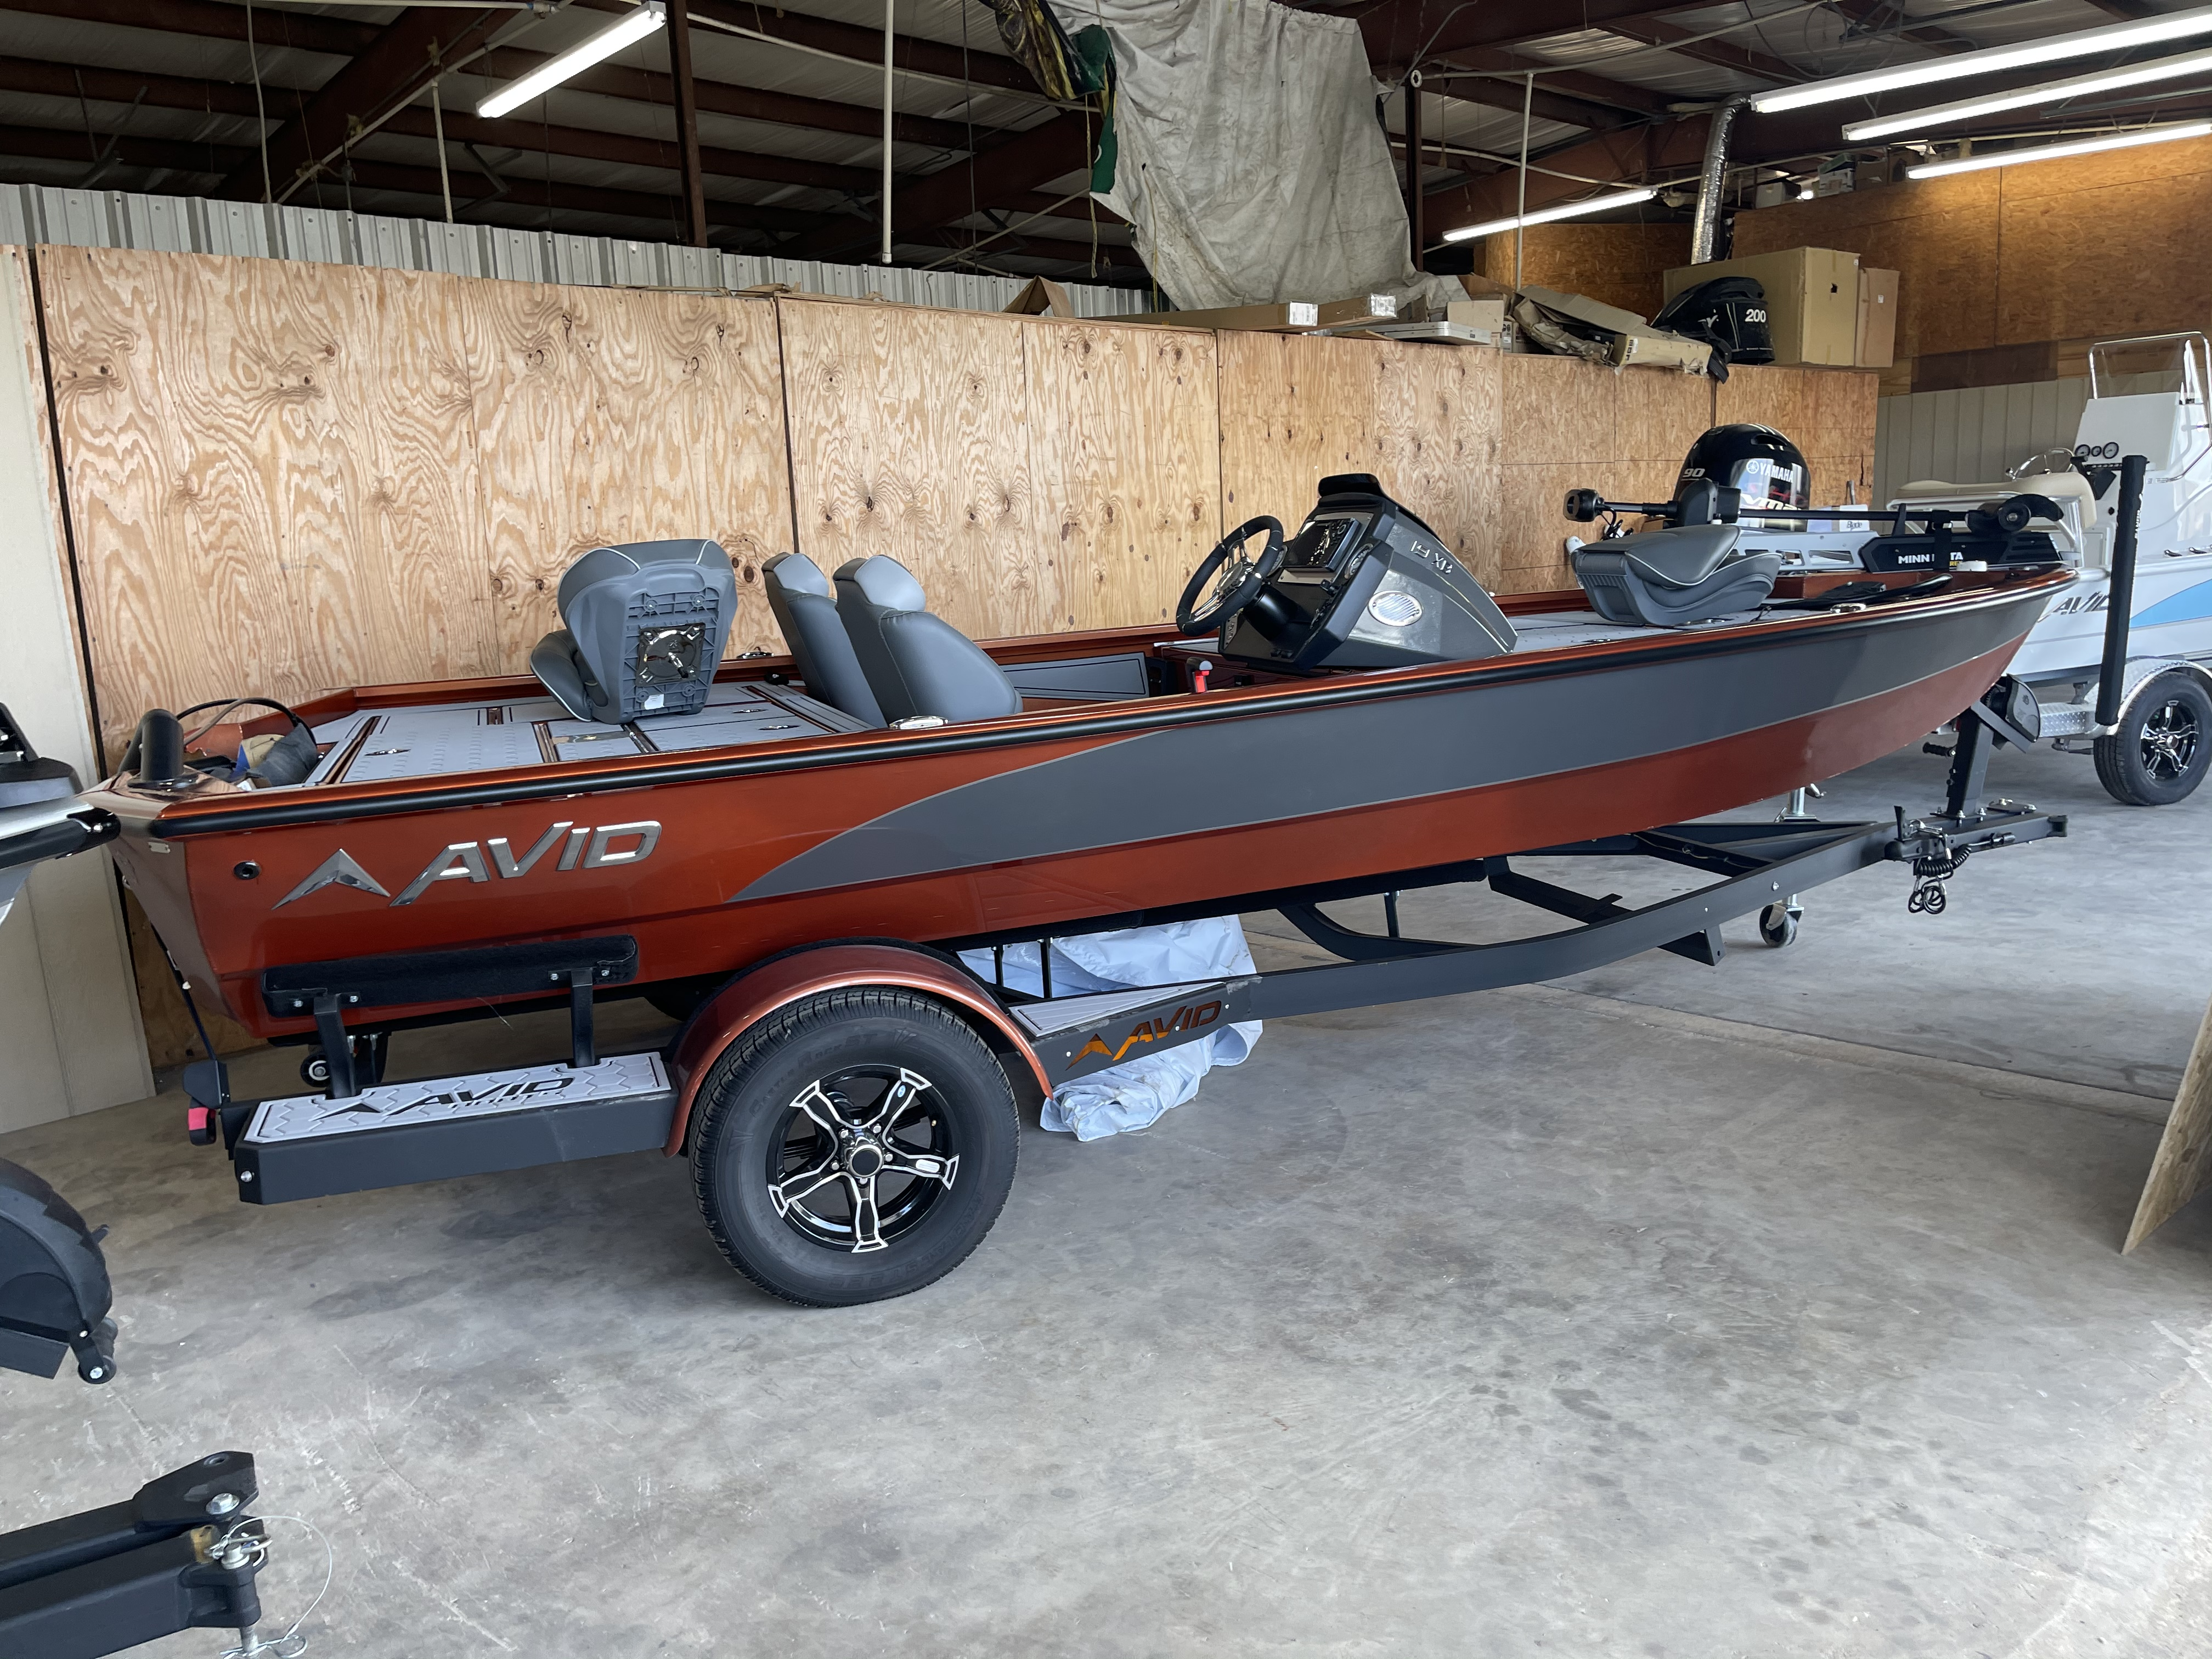 Avid 19XB 19' Aluminum Best Bass Boat Yamaha 150 hp SHO Outboard Motor